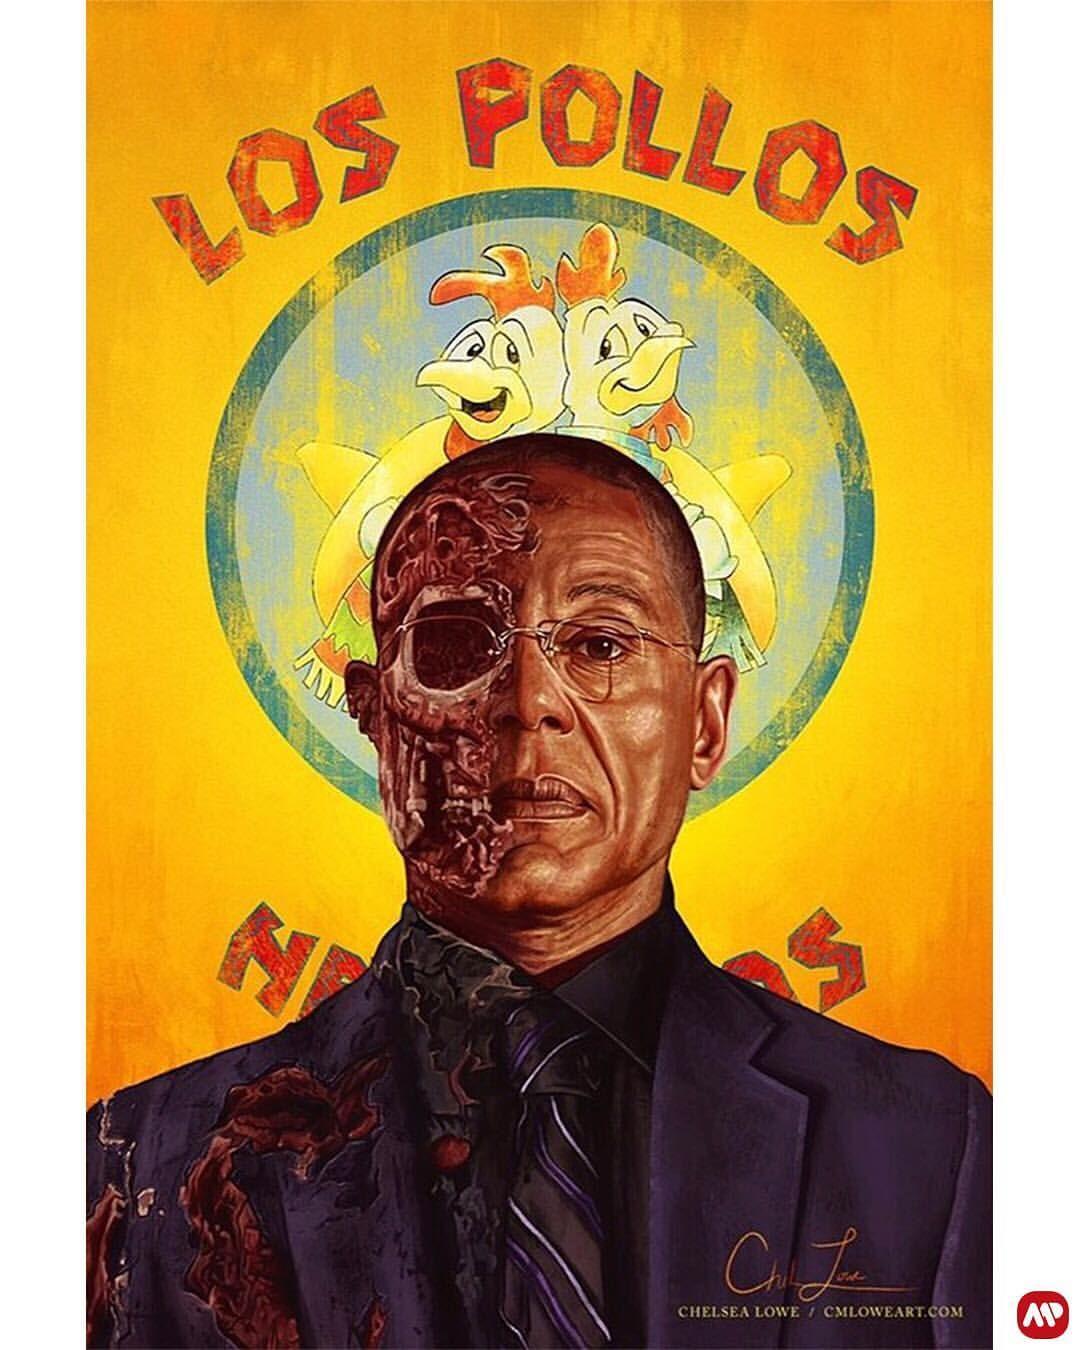 Breaking Bad, Gus Fring, Los Pollos Hermanos.